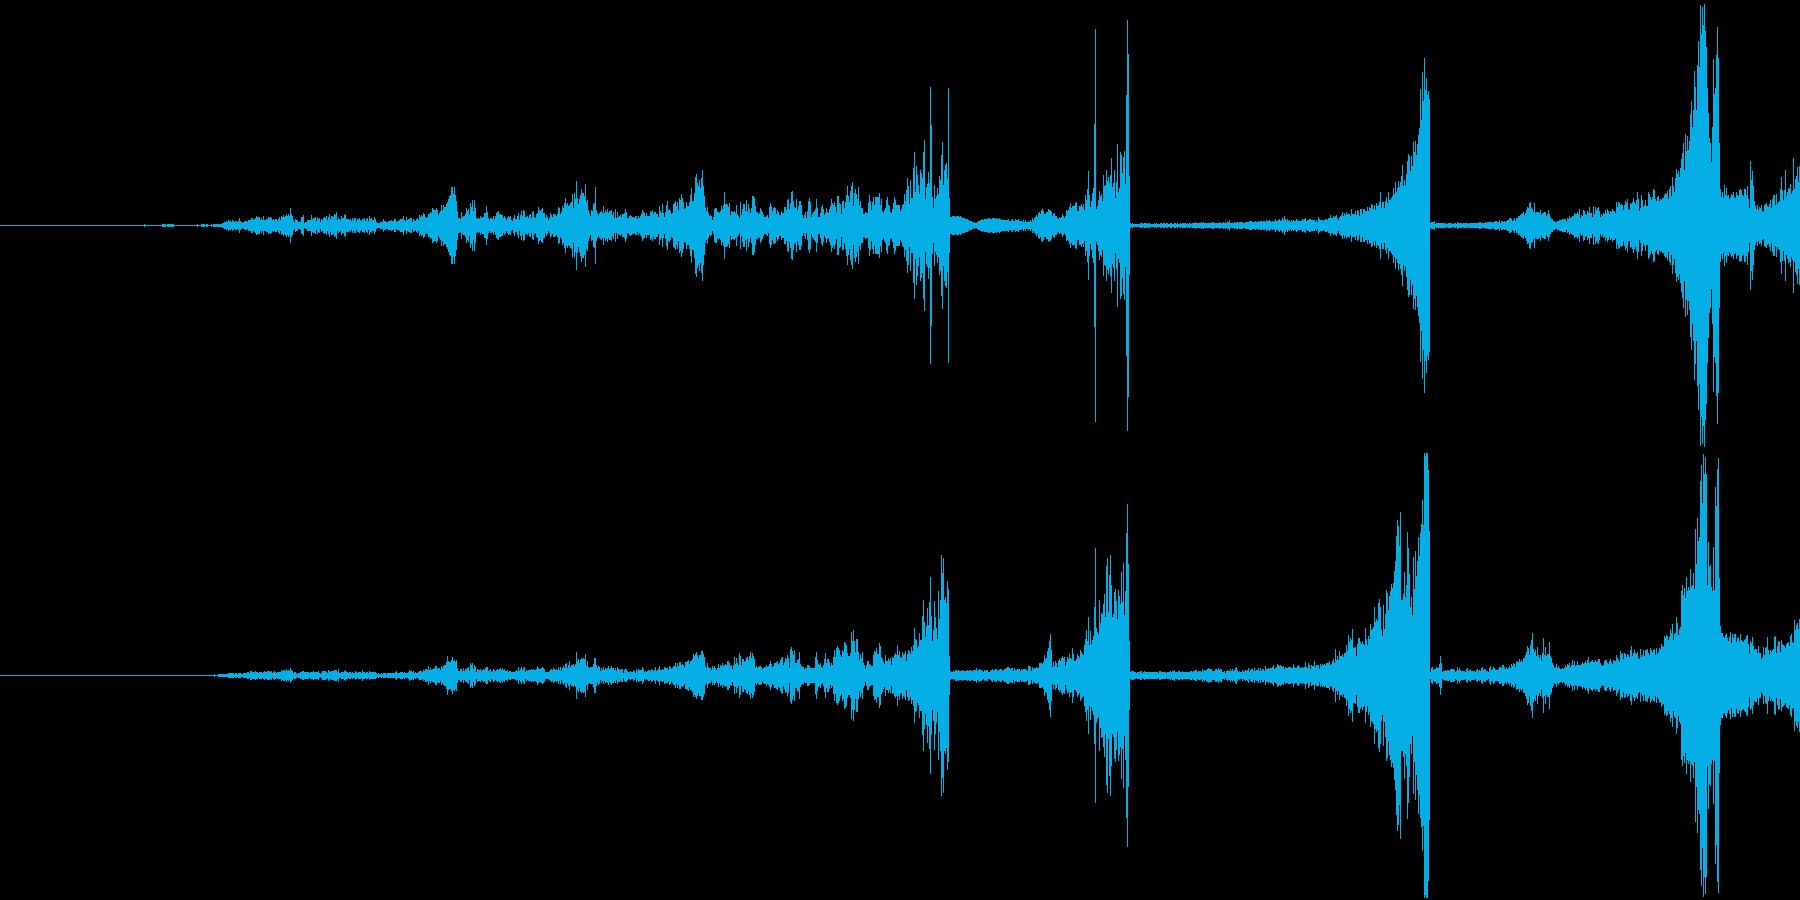 Zap 巻き戻し音・ザップ効果音 2の再生済みの波形